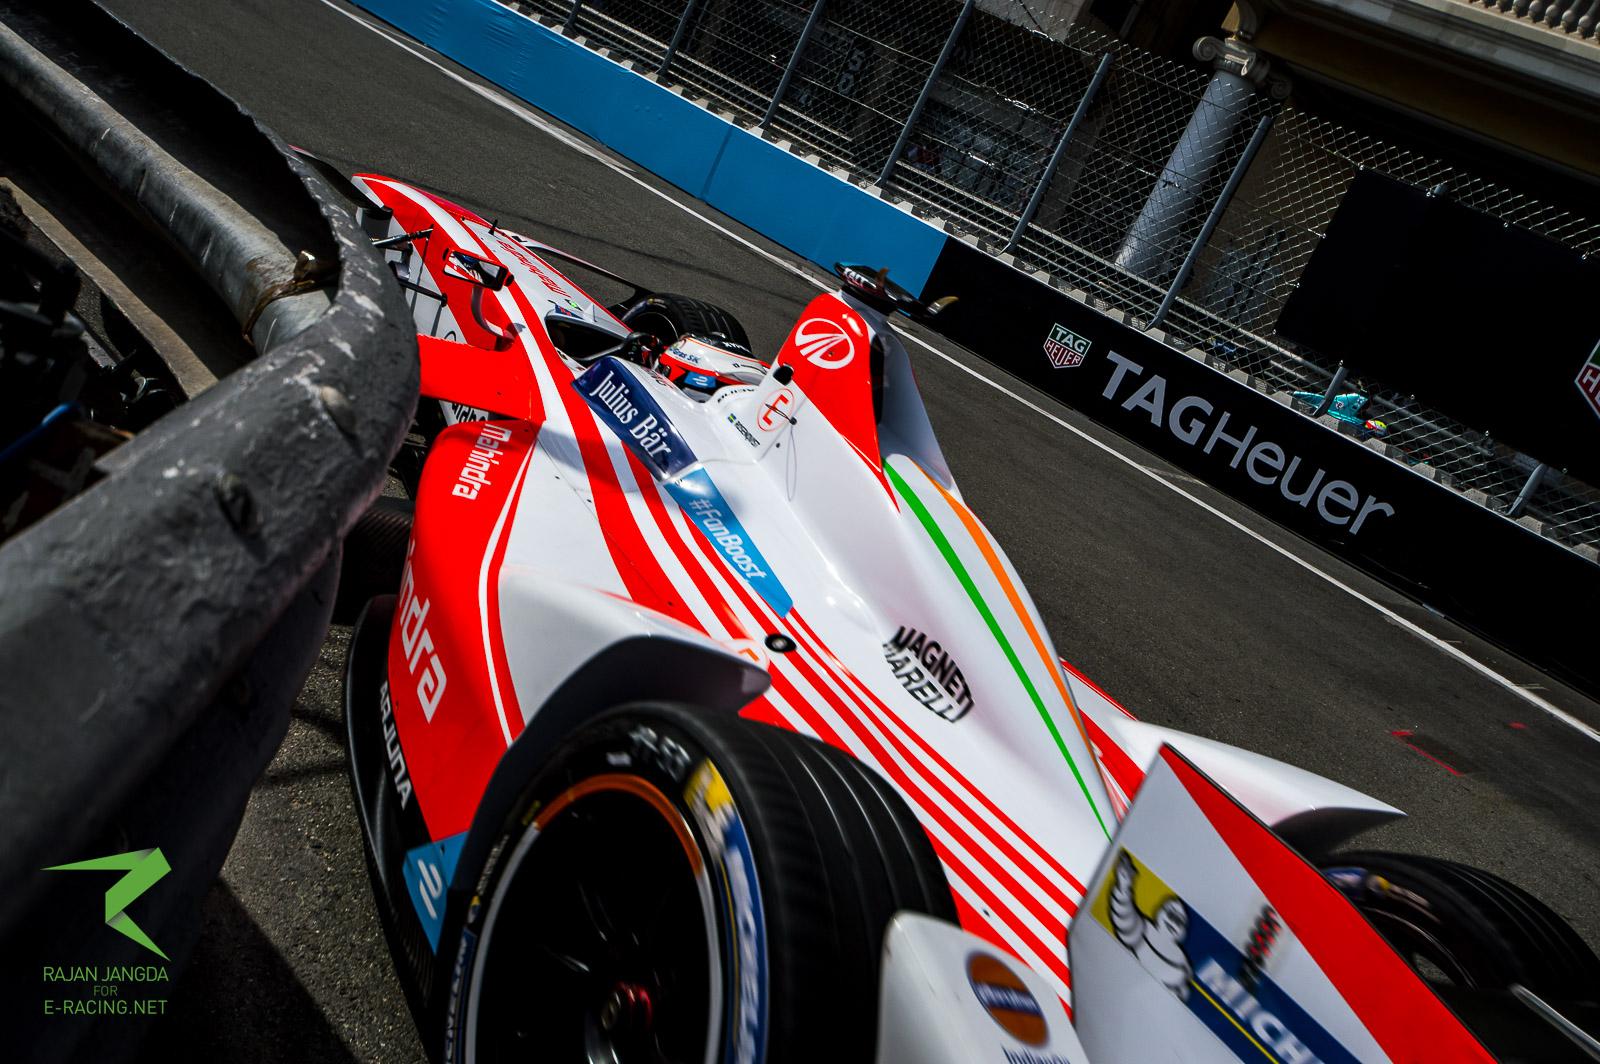 19 Felix Rosenqvist SWE - Mahindra Racing Formula E Team - Mahindra M3ELECTRO--2-1